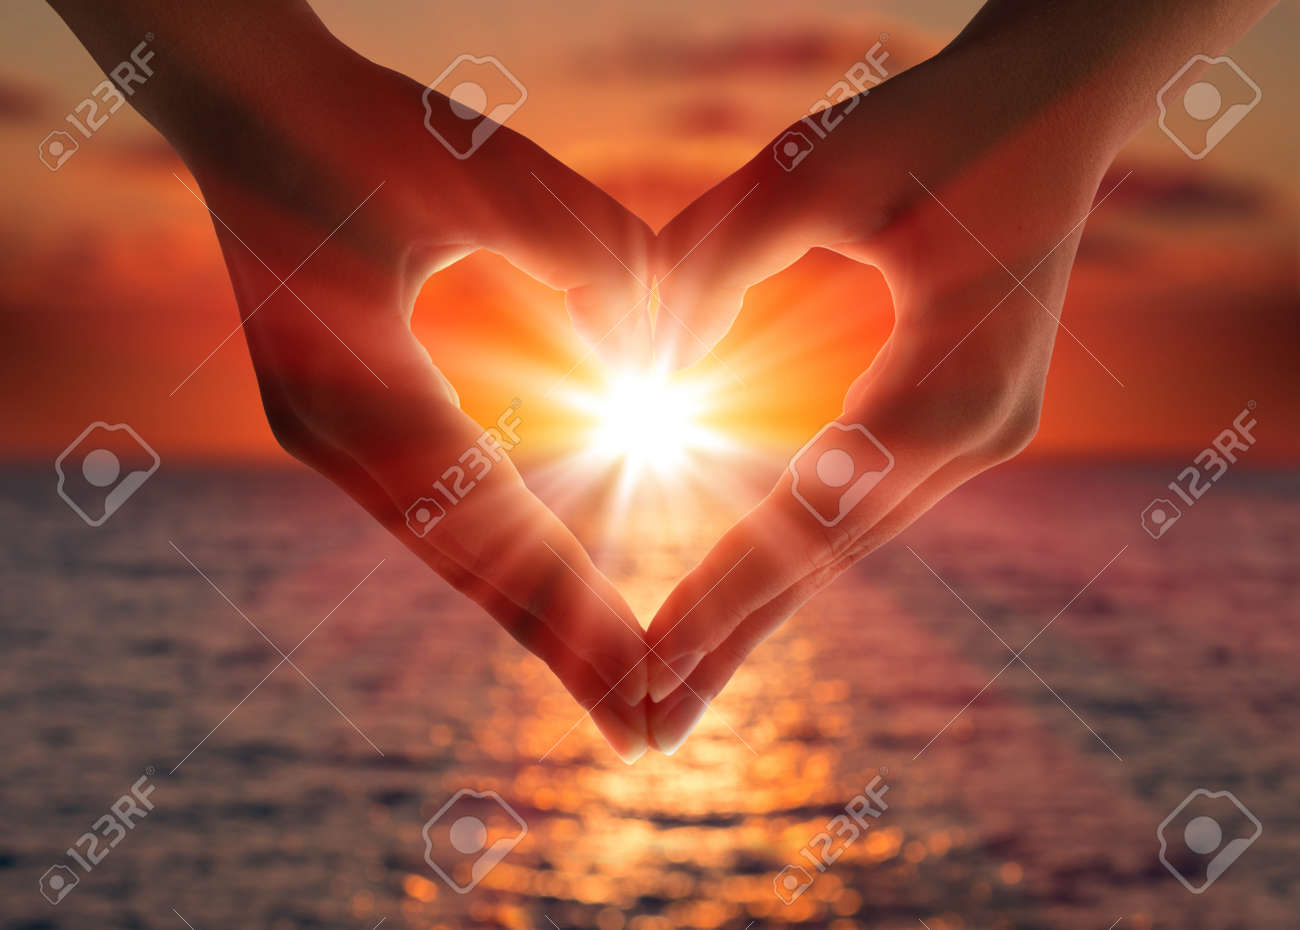 Zu herzen bilder 3 Herzen